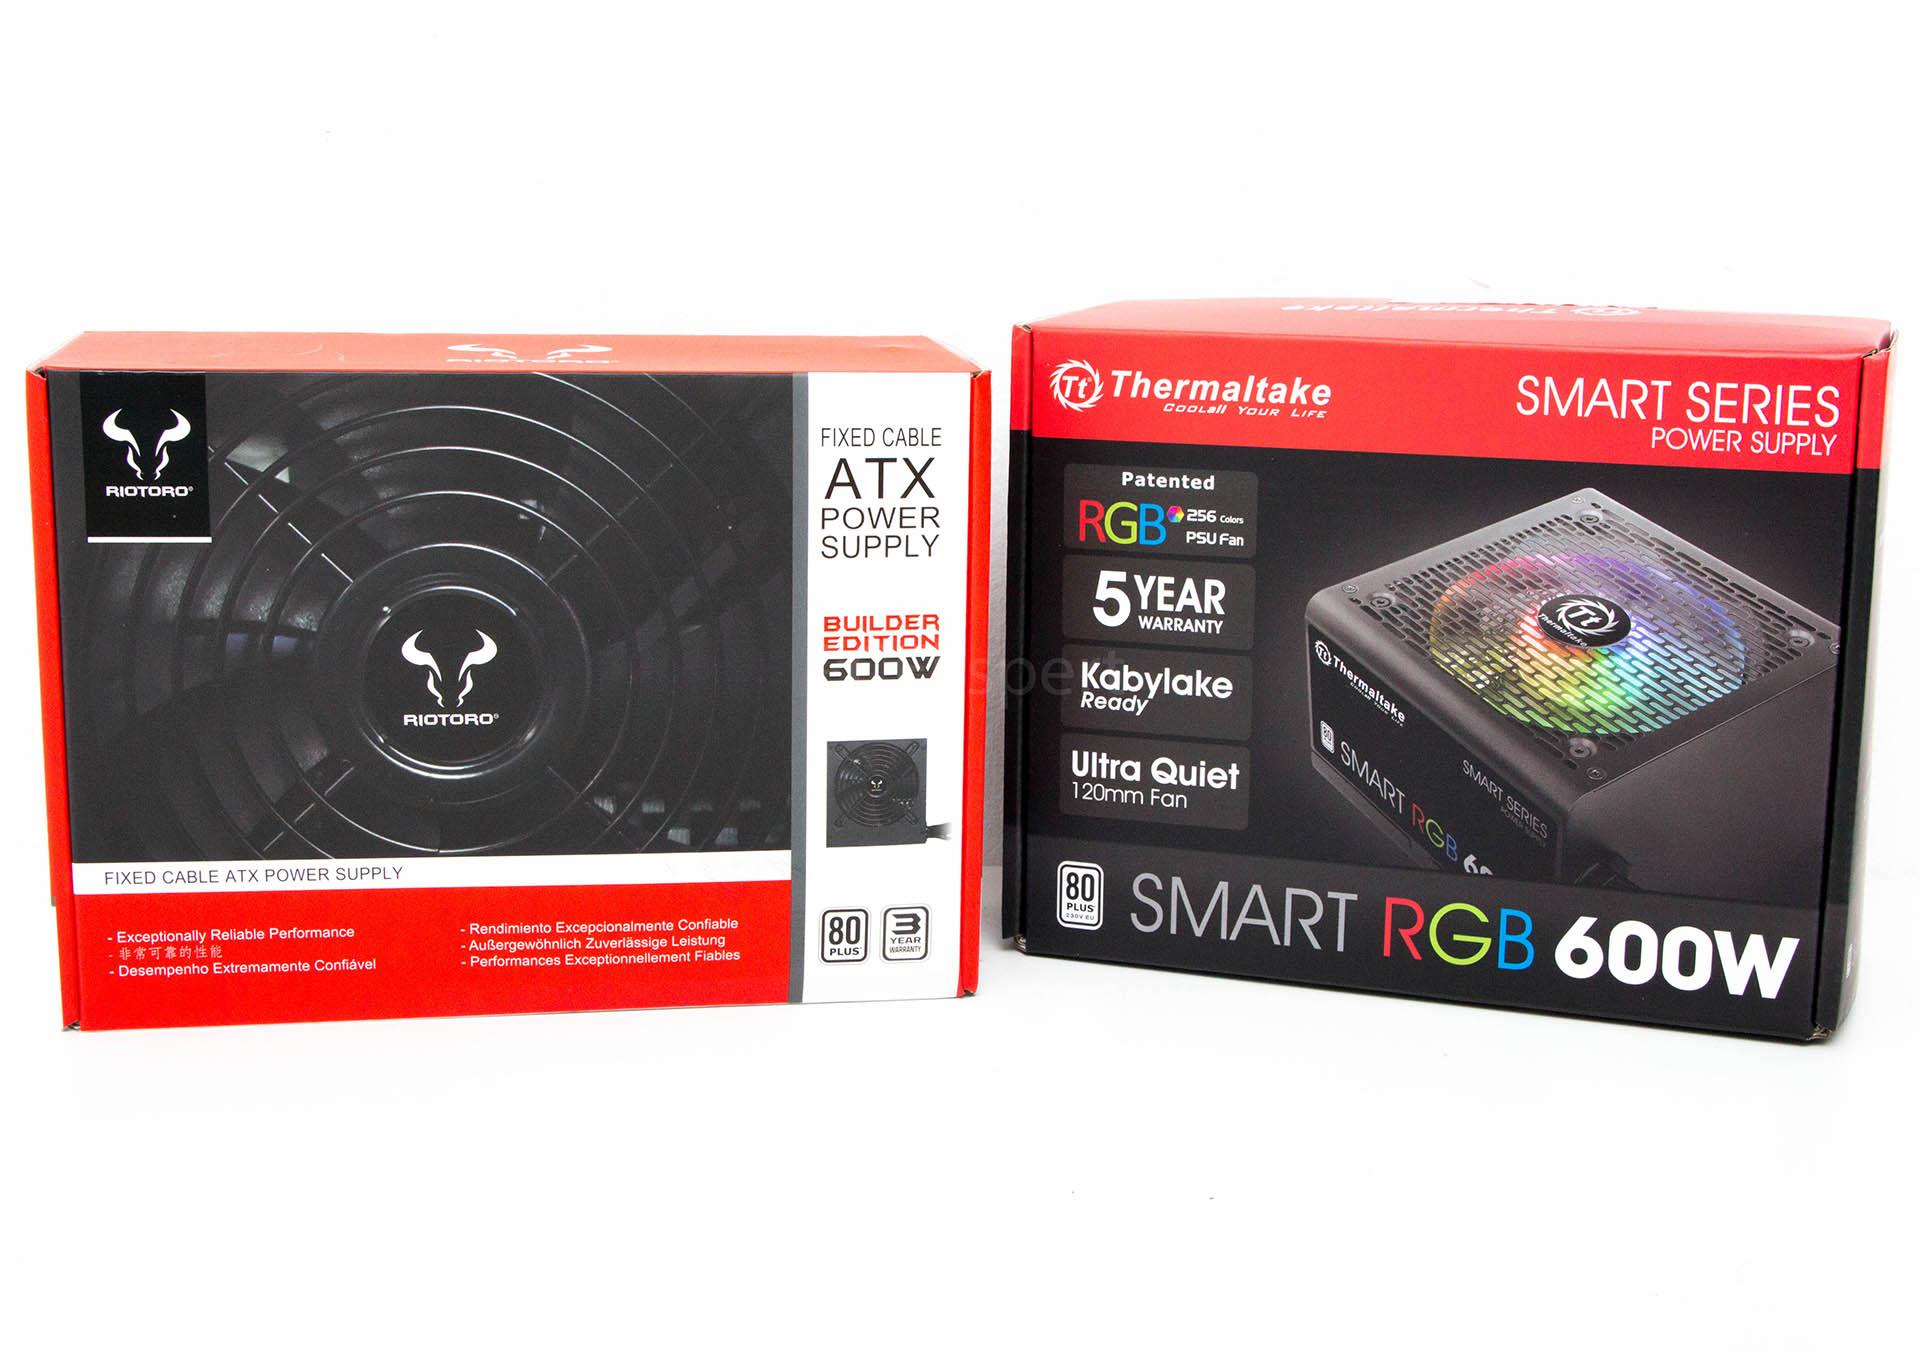 Brzi test – Riotoro Builder Edition 600W vs. Thermaltake Smart RGB 600W